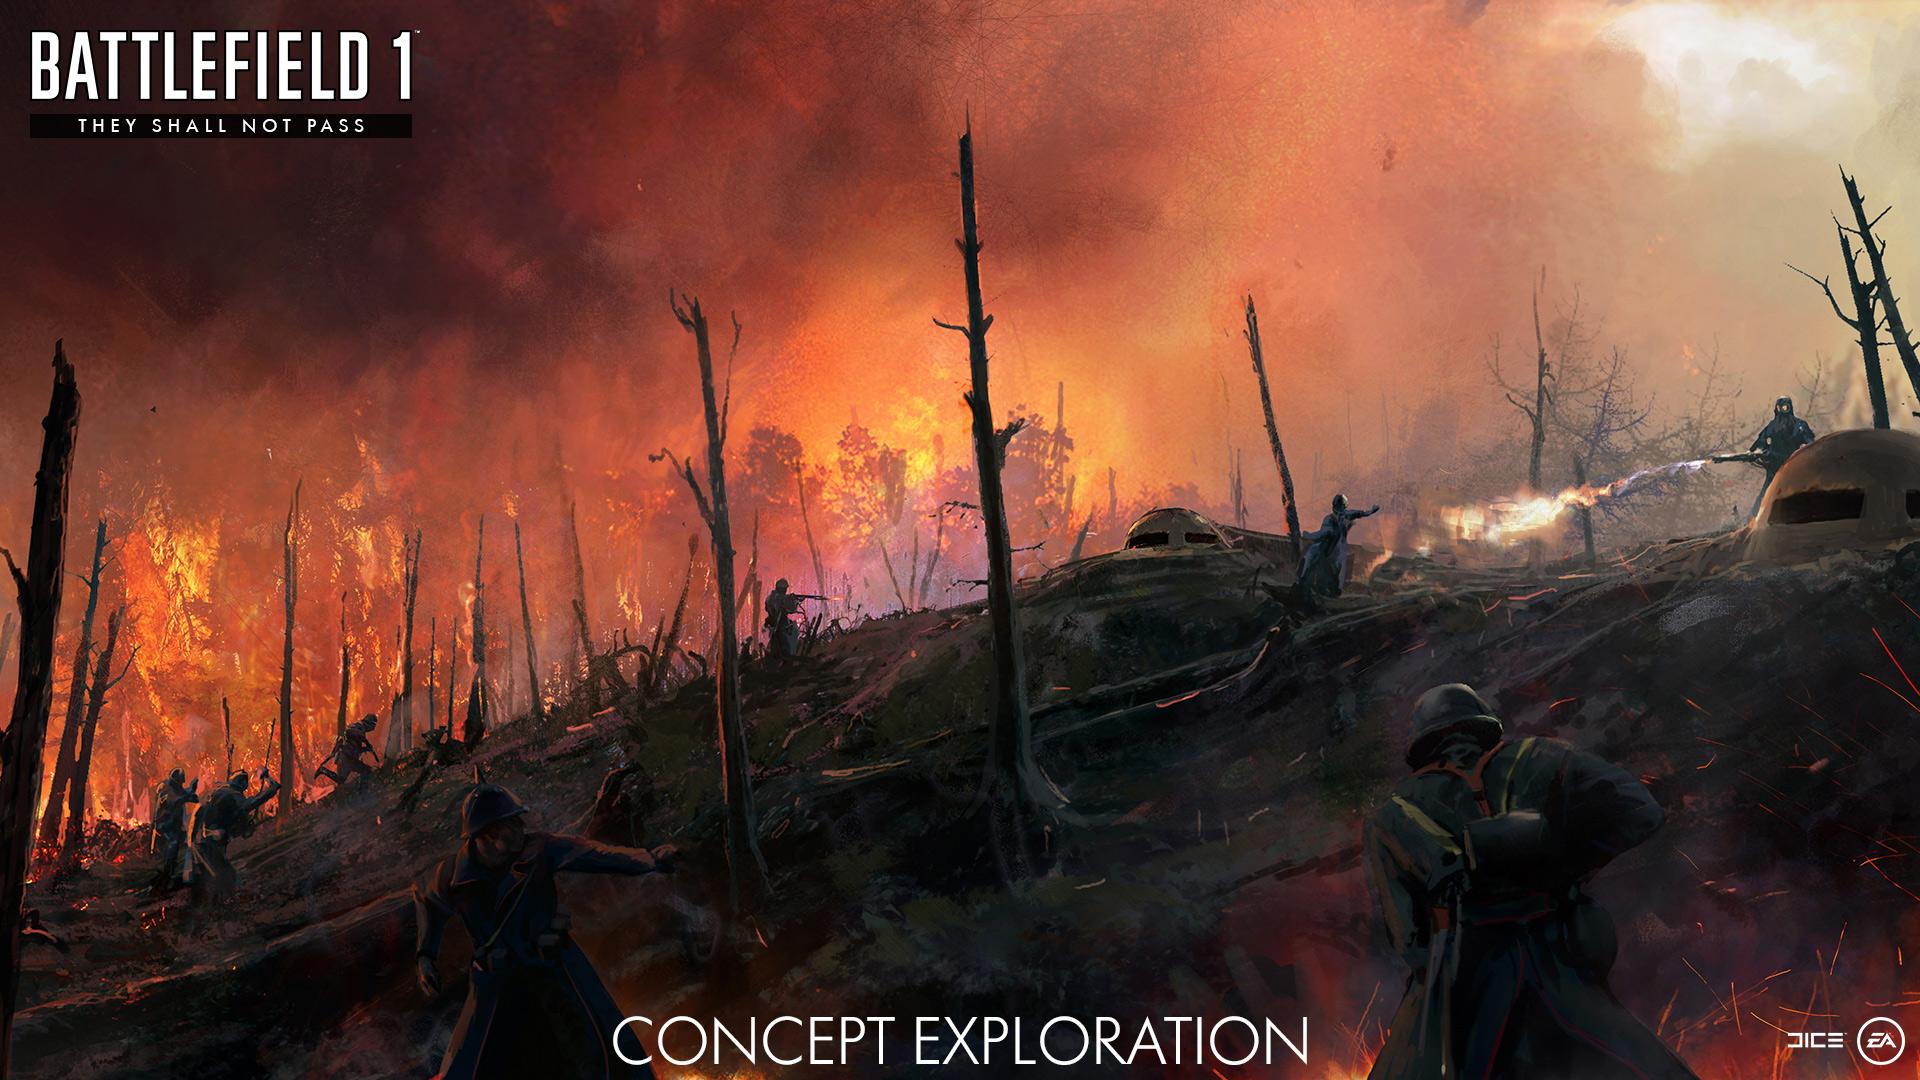 First battlefield 1 expansion they shall not pass gets - Battlefield v concept art wallpaper ...